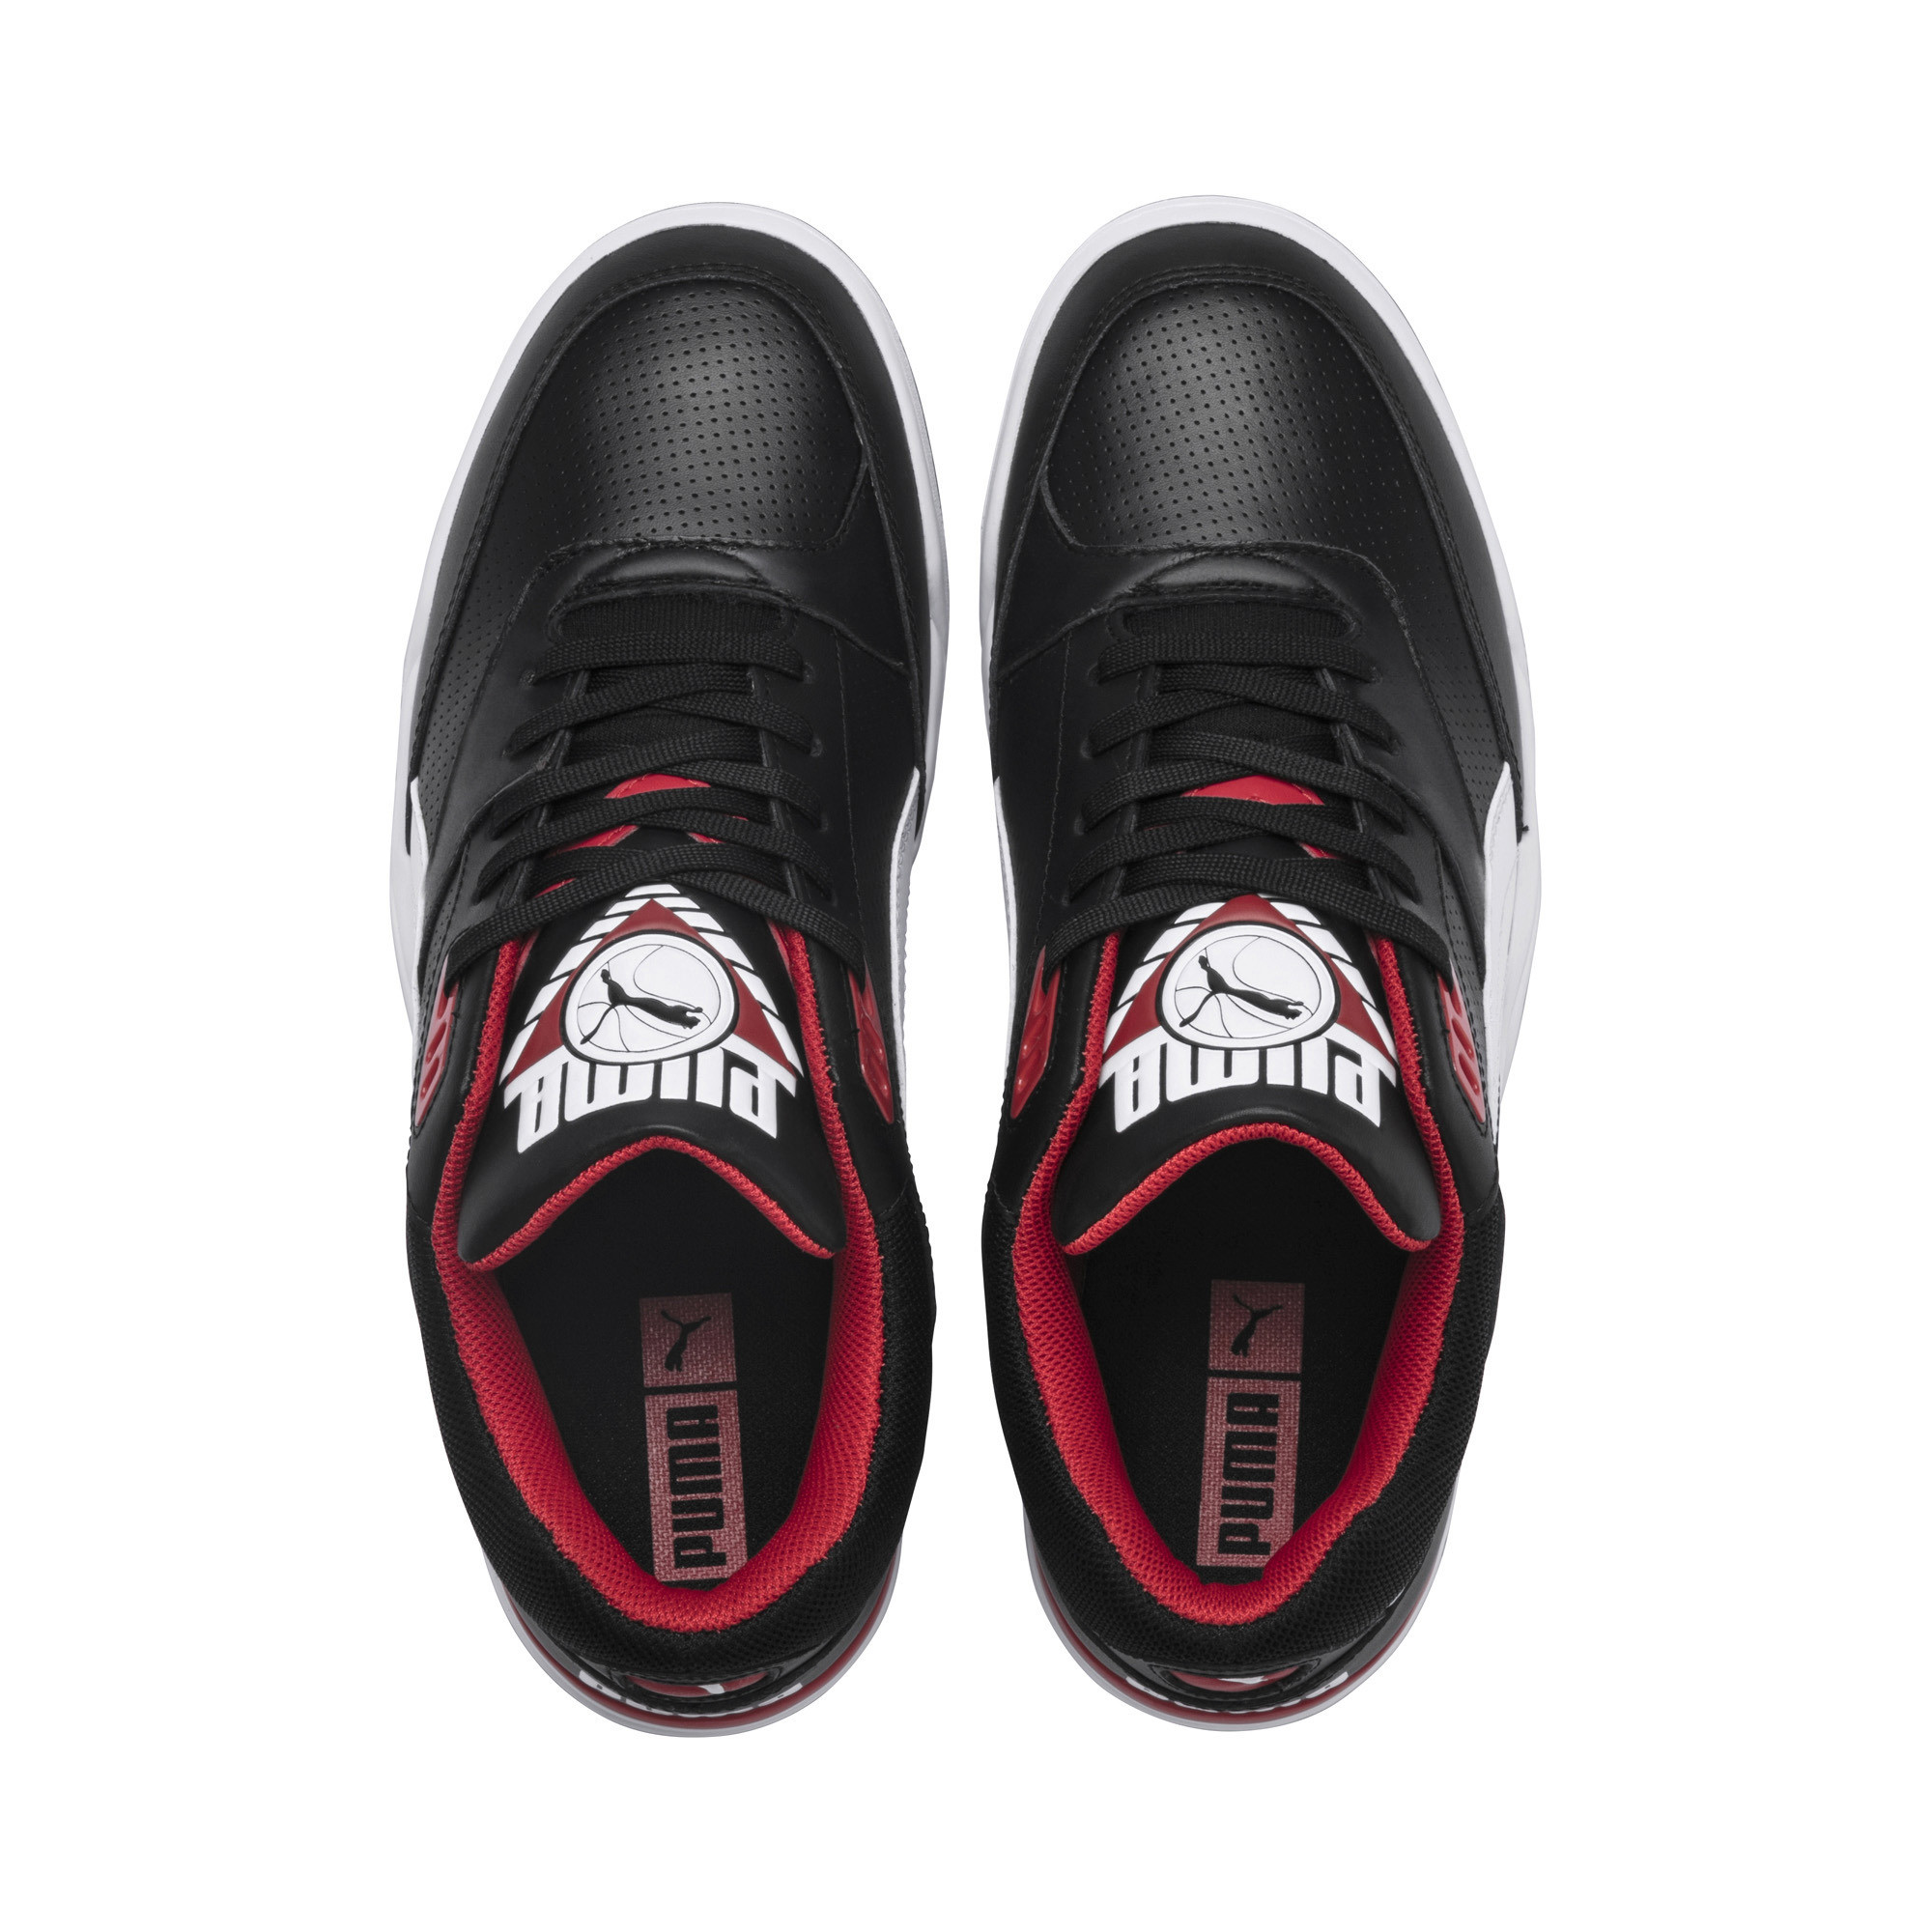 Indexbild 7 - PUMA Palace Guard Sneaker Unisex Schuhe Sport Classics Neu